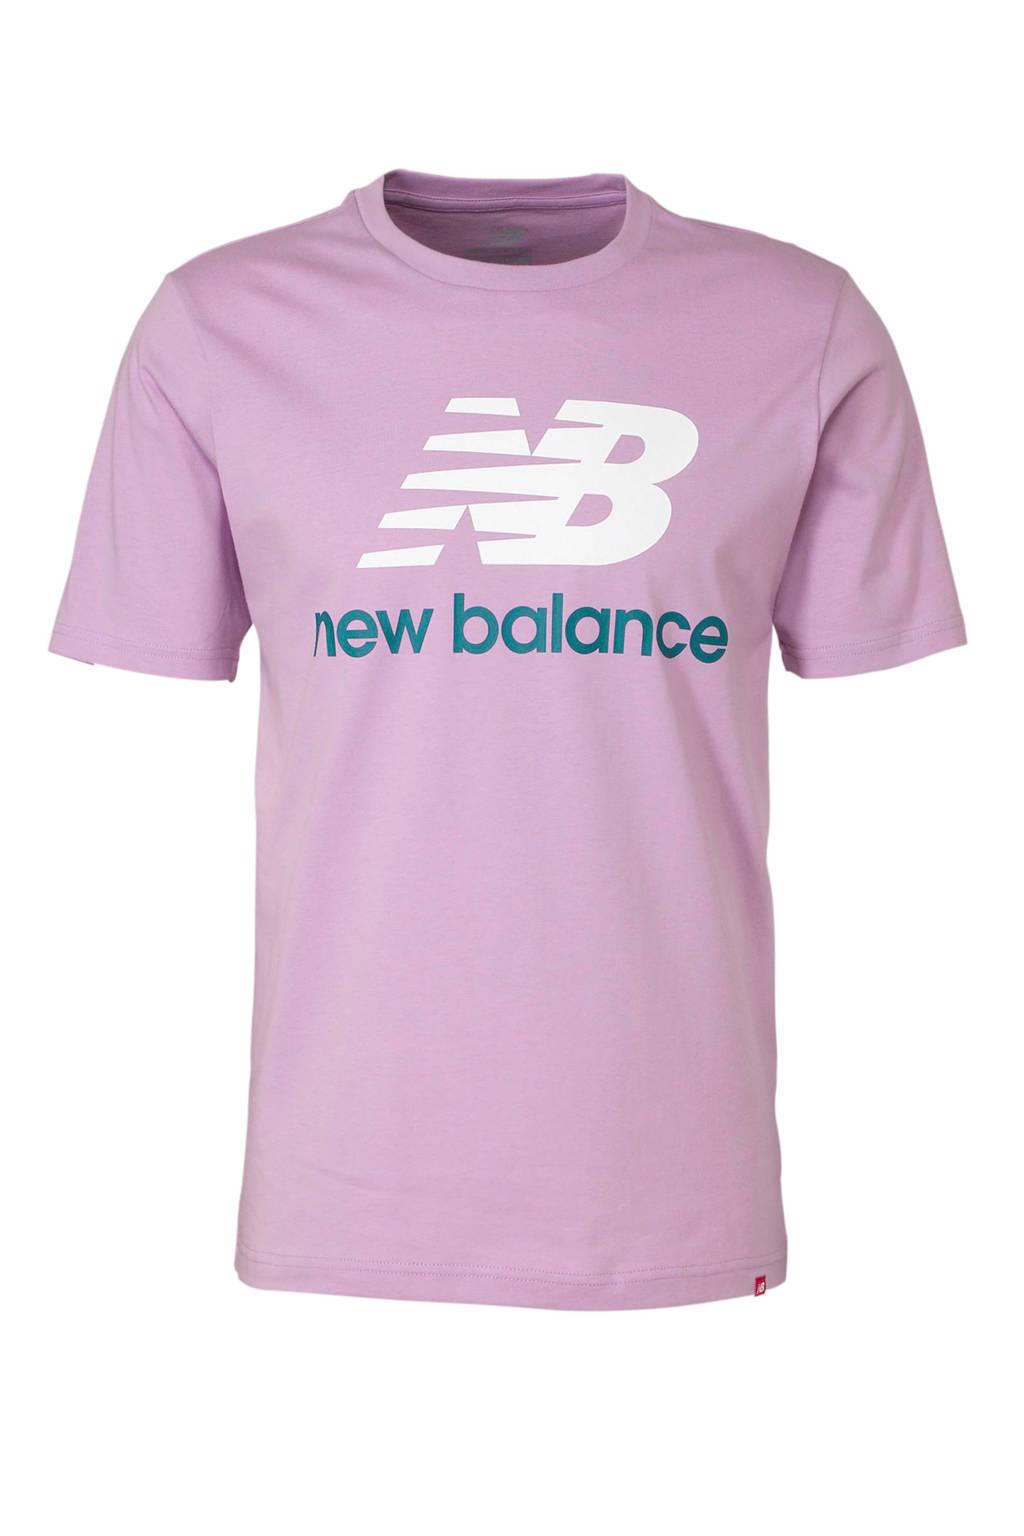 New Balance   T-shirt lila, Lila/wit/donkerblauw